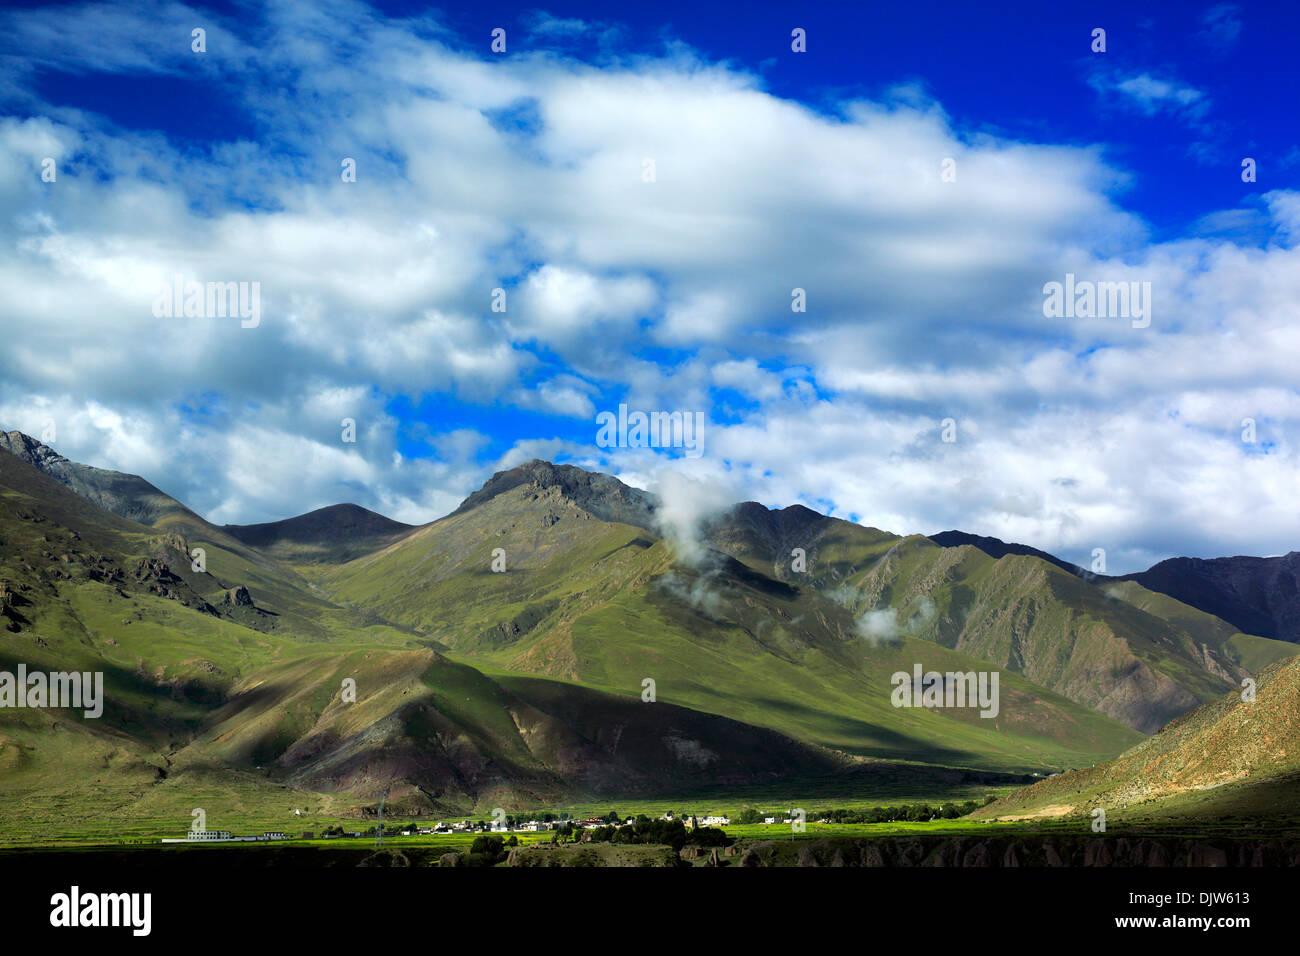 Landscape viewed from train of Trans-Tibetan Railway, Tibet, China - Stock Image